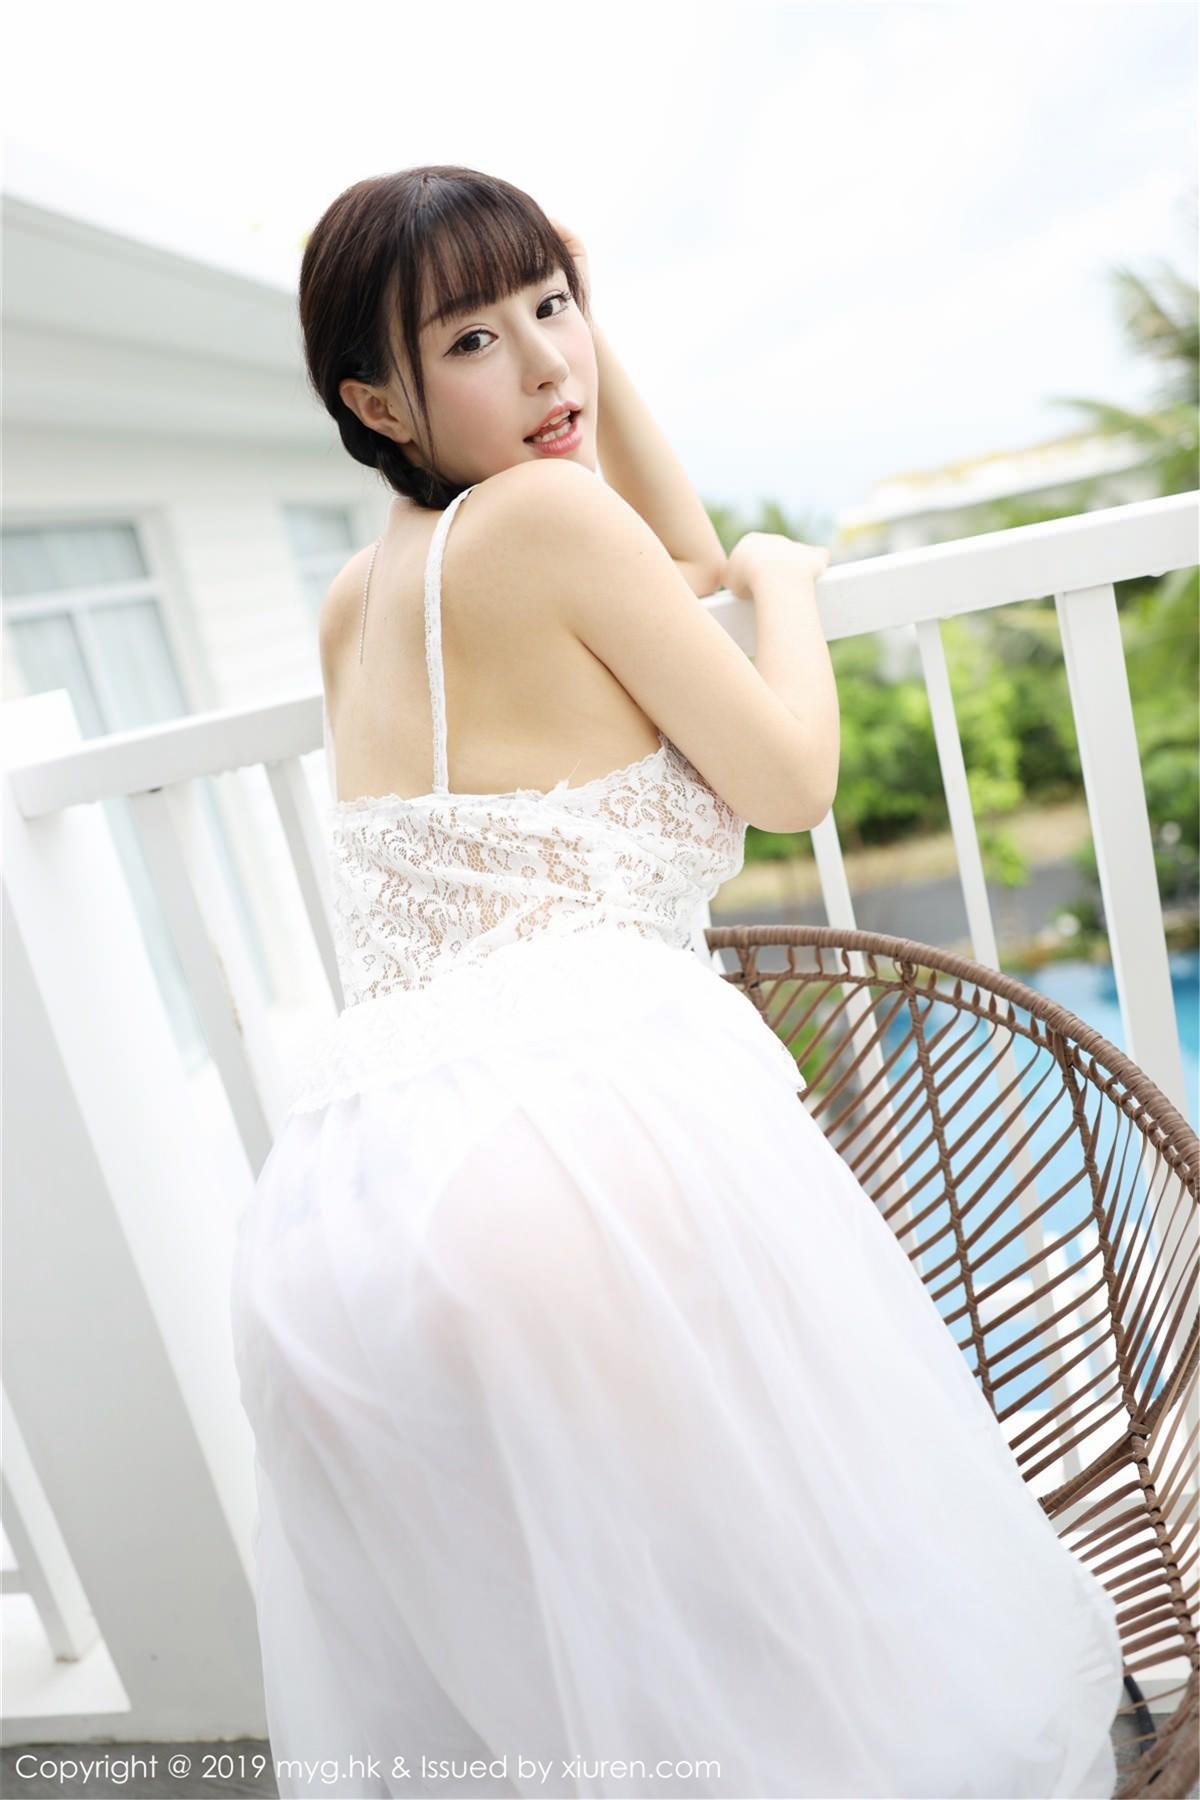 MyGirl Vol.360 34P, mygirl, Zhu Ke Er